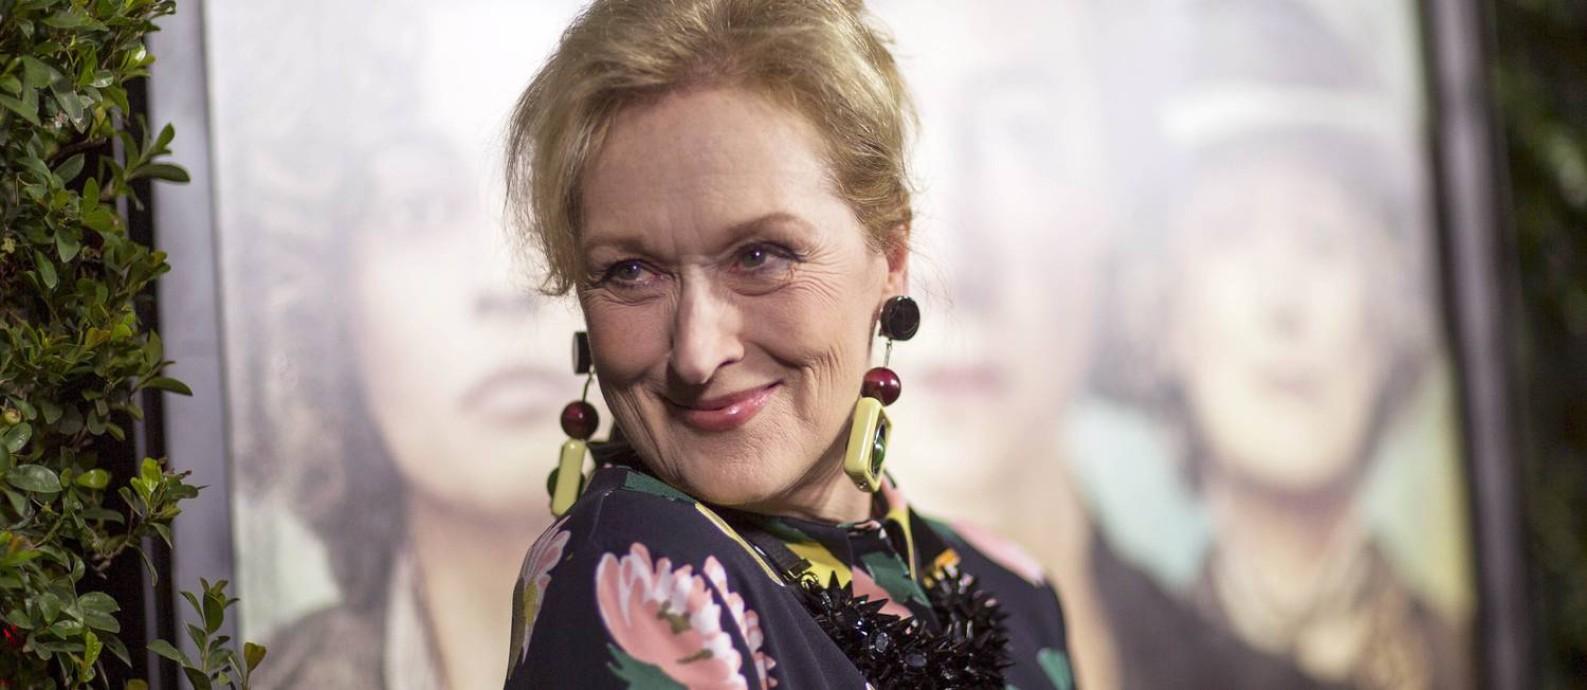 A atriz Meryl Streep Foto: MARIO ANZUONI / REUTERS